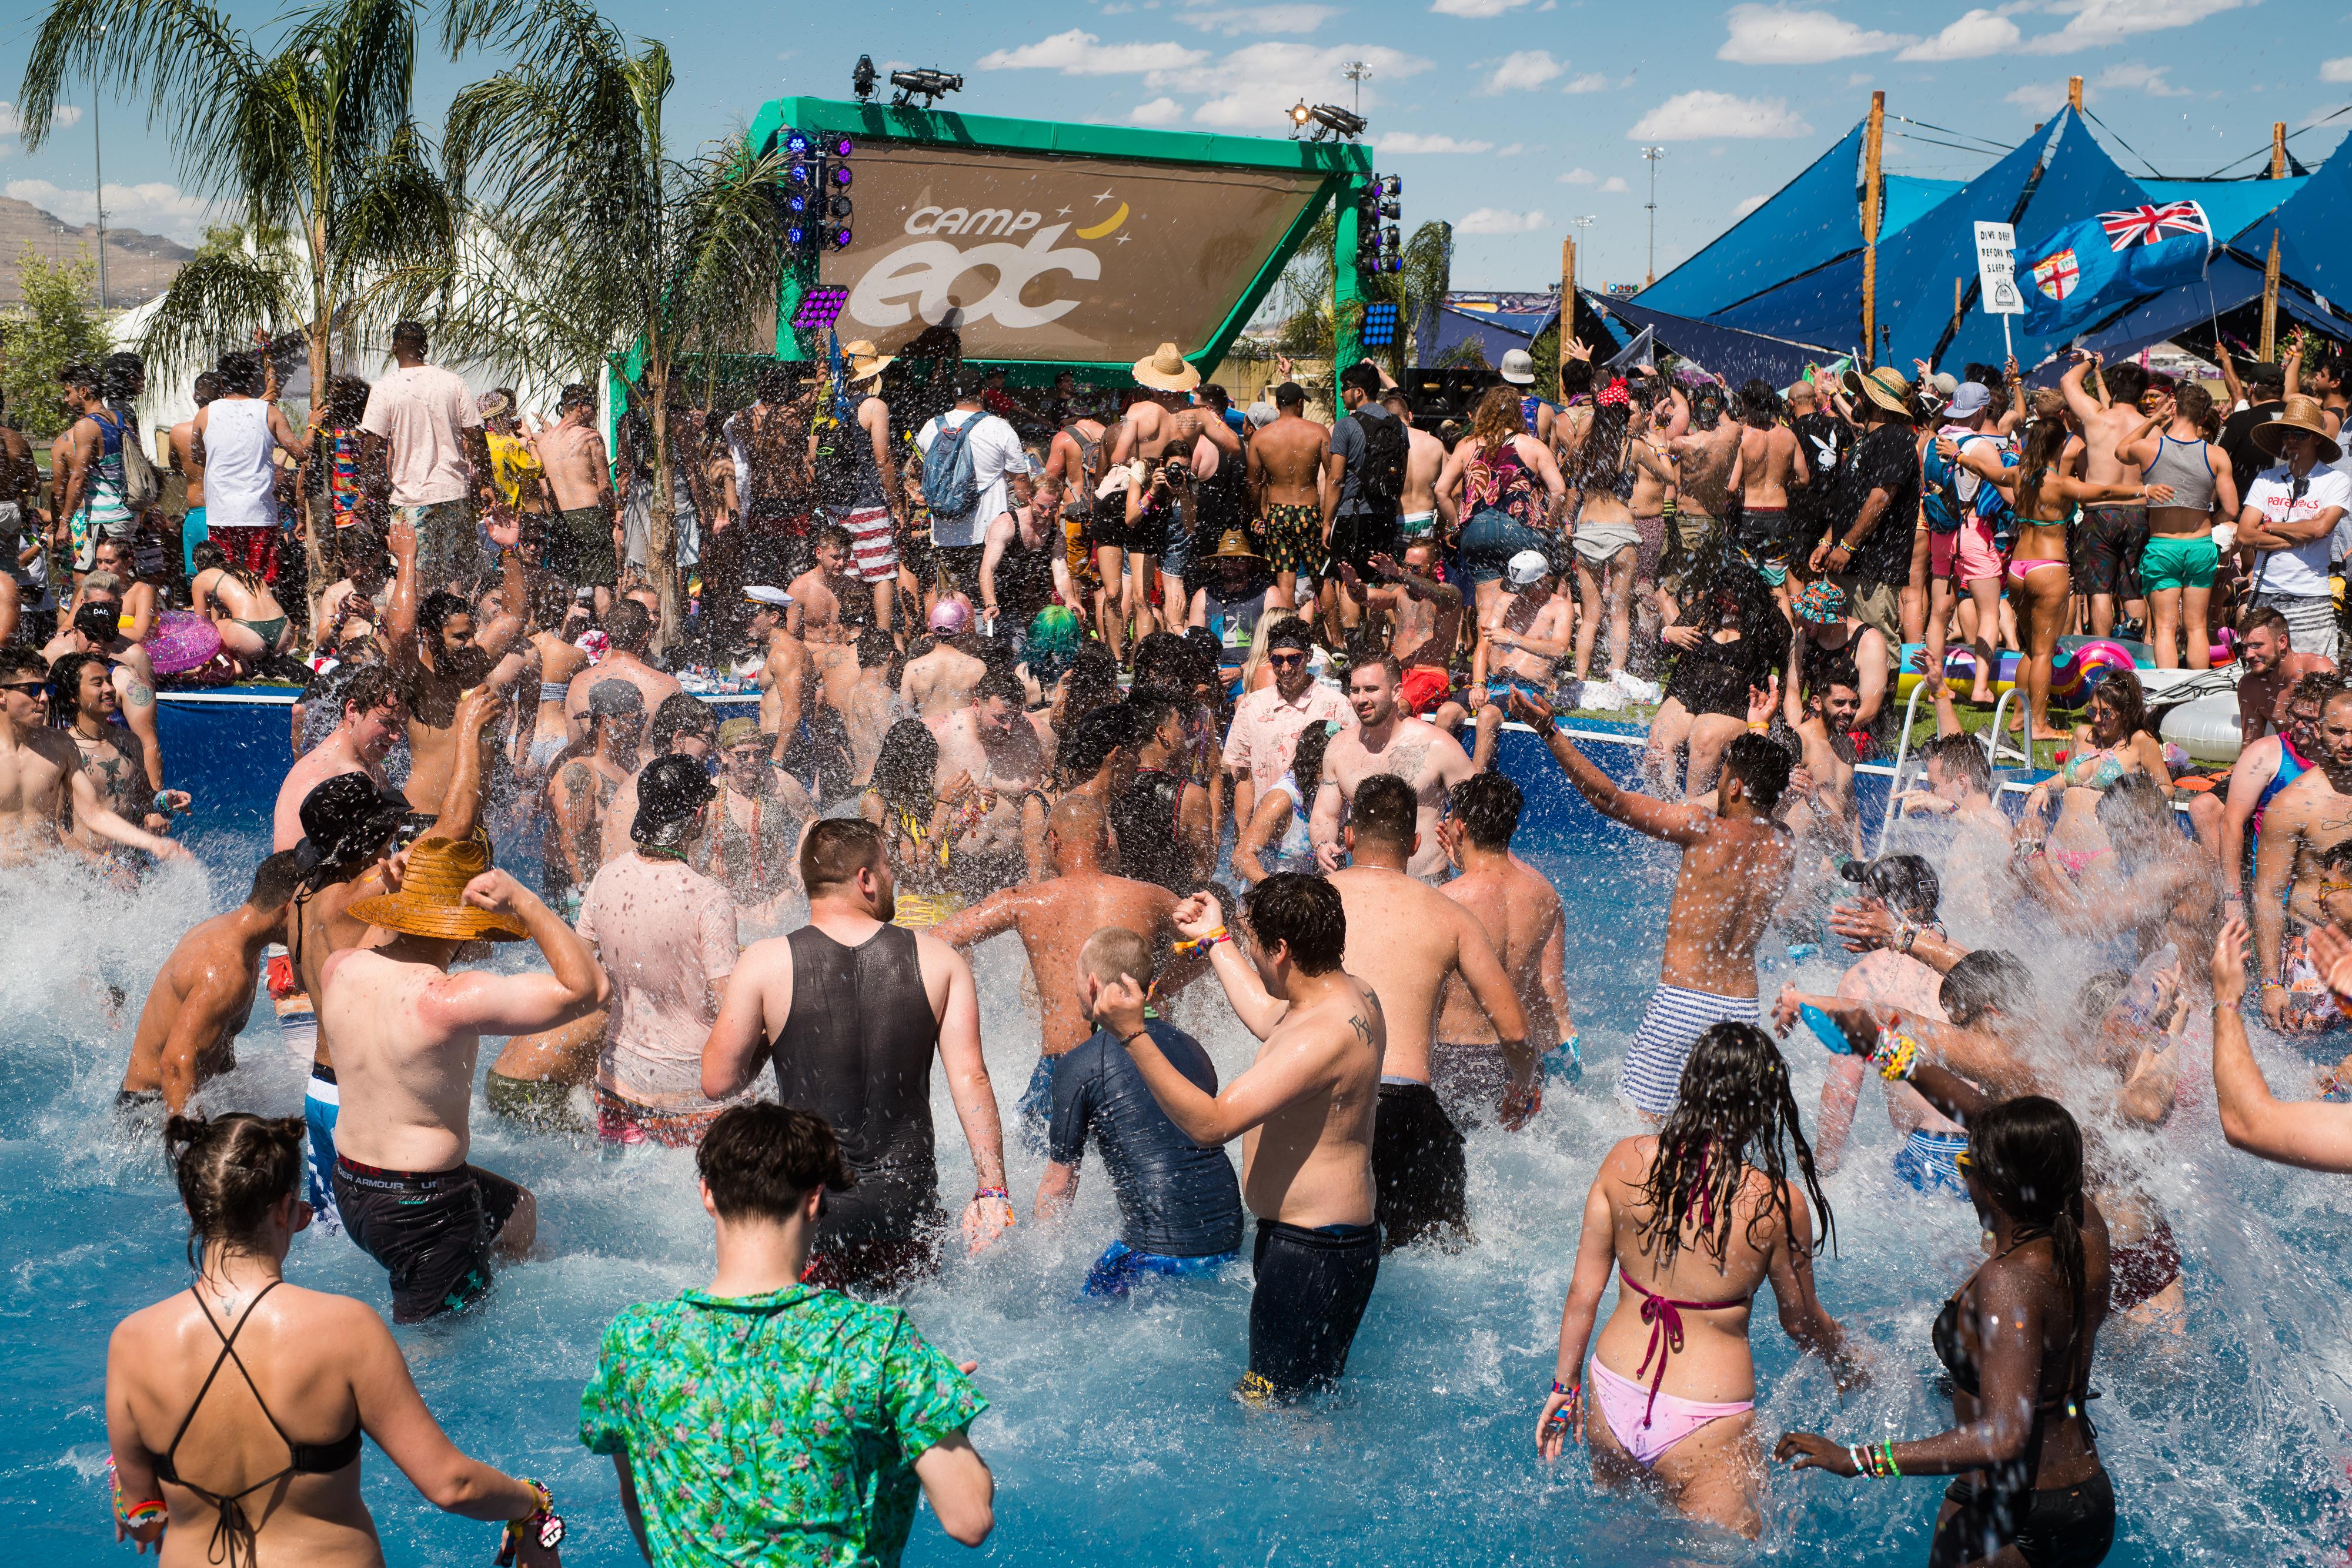 EDC Las Vegas Reveals Artist Sets for Camping, Yoga & More